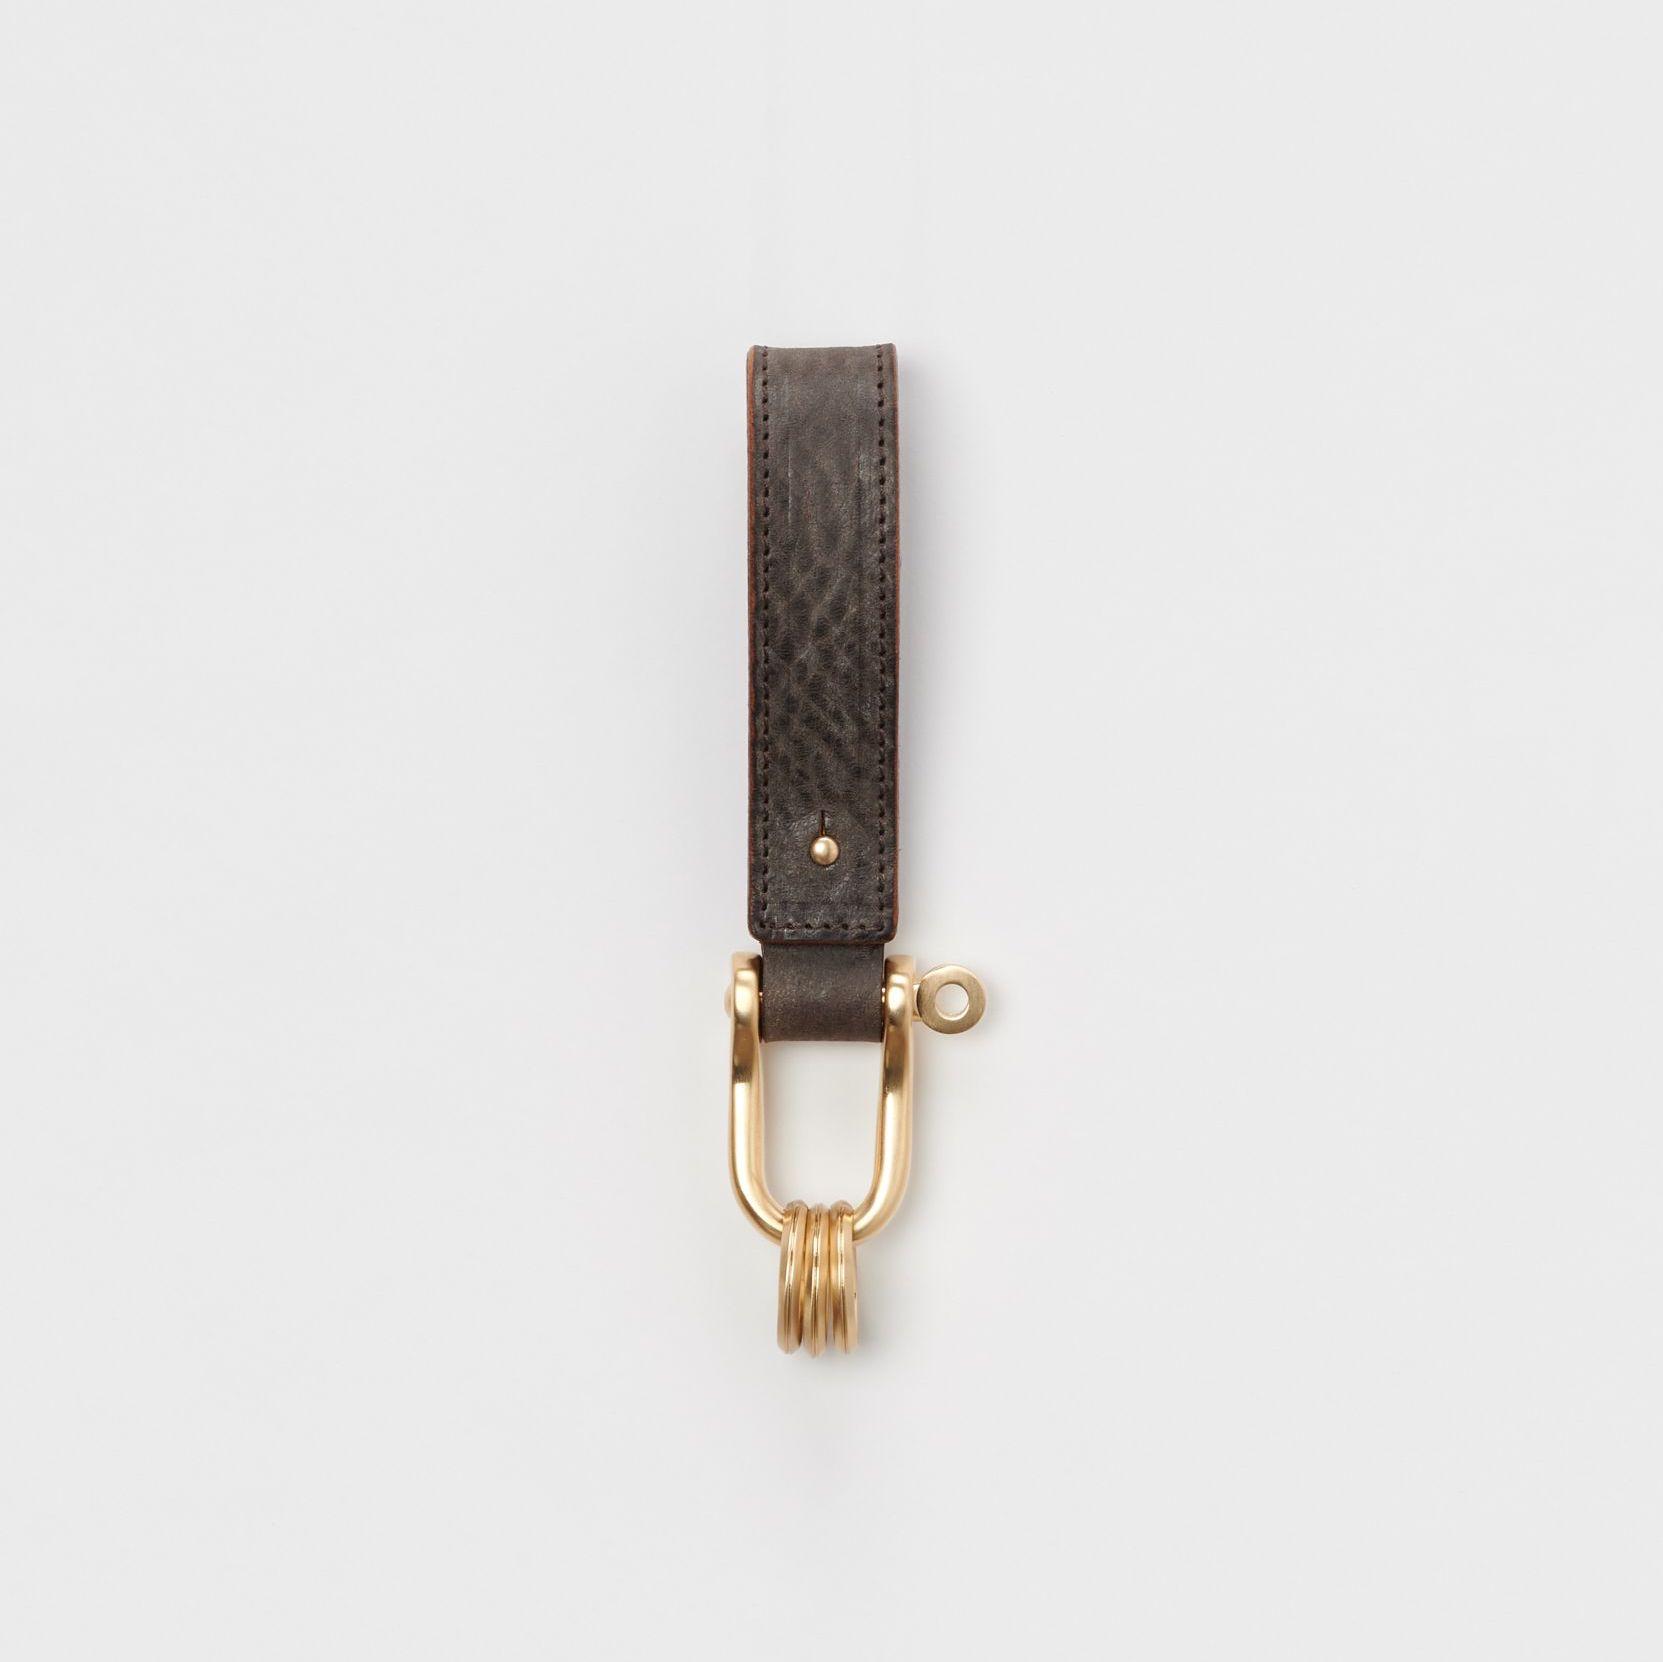 Hender Scheme / key shackle 背面